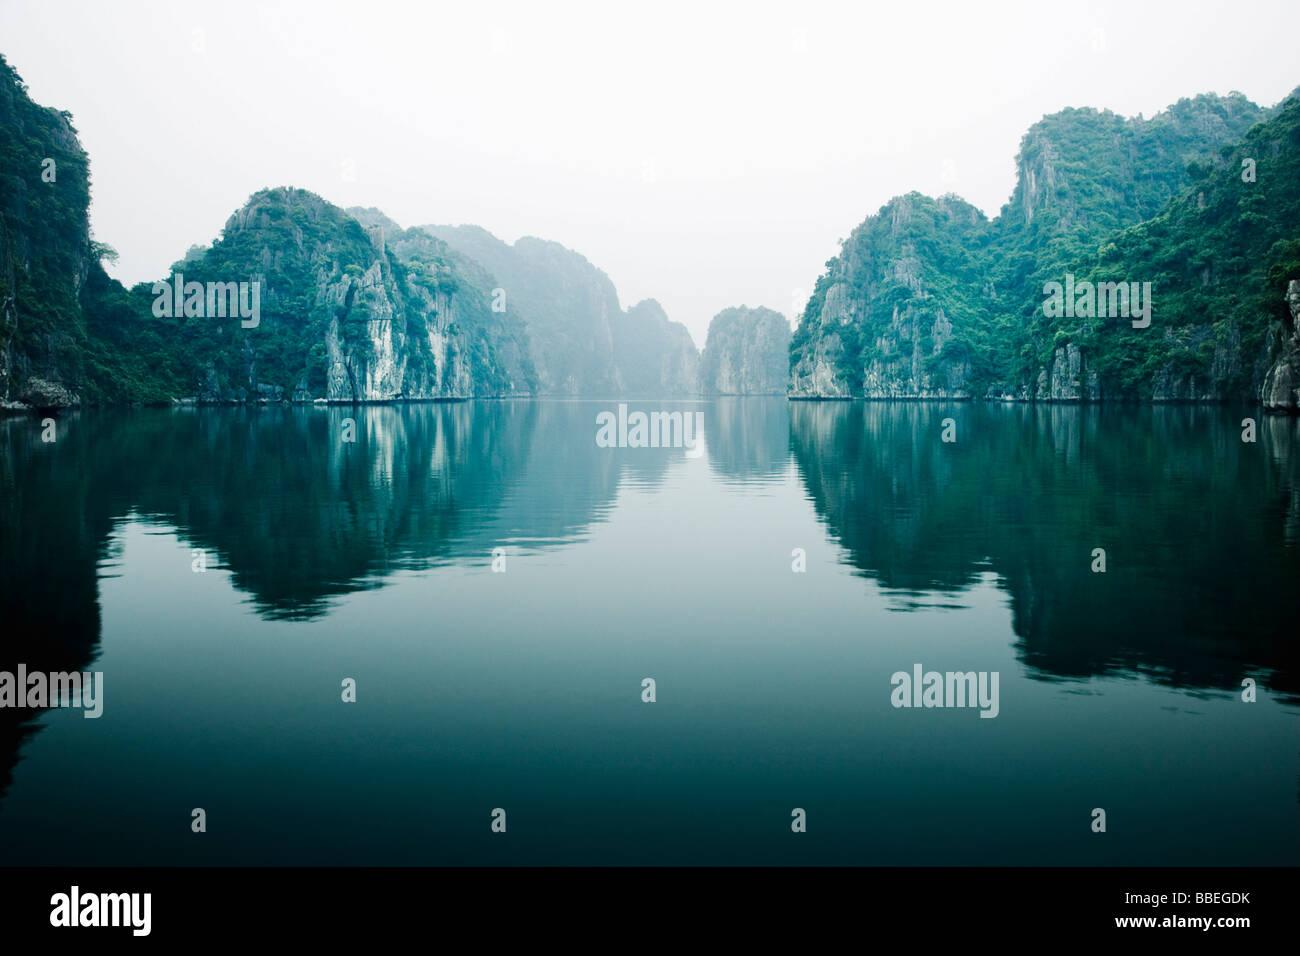 Gulf of Tonkin, Halong Bay, Quang Ninh Province, Vietnam Stock Photo